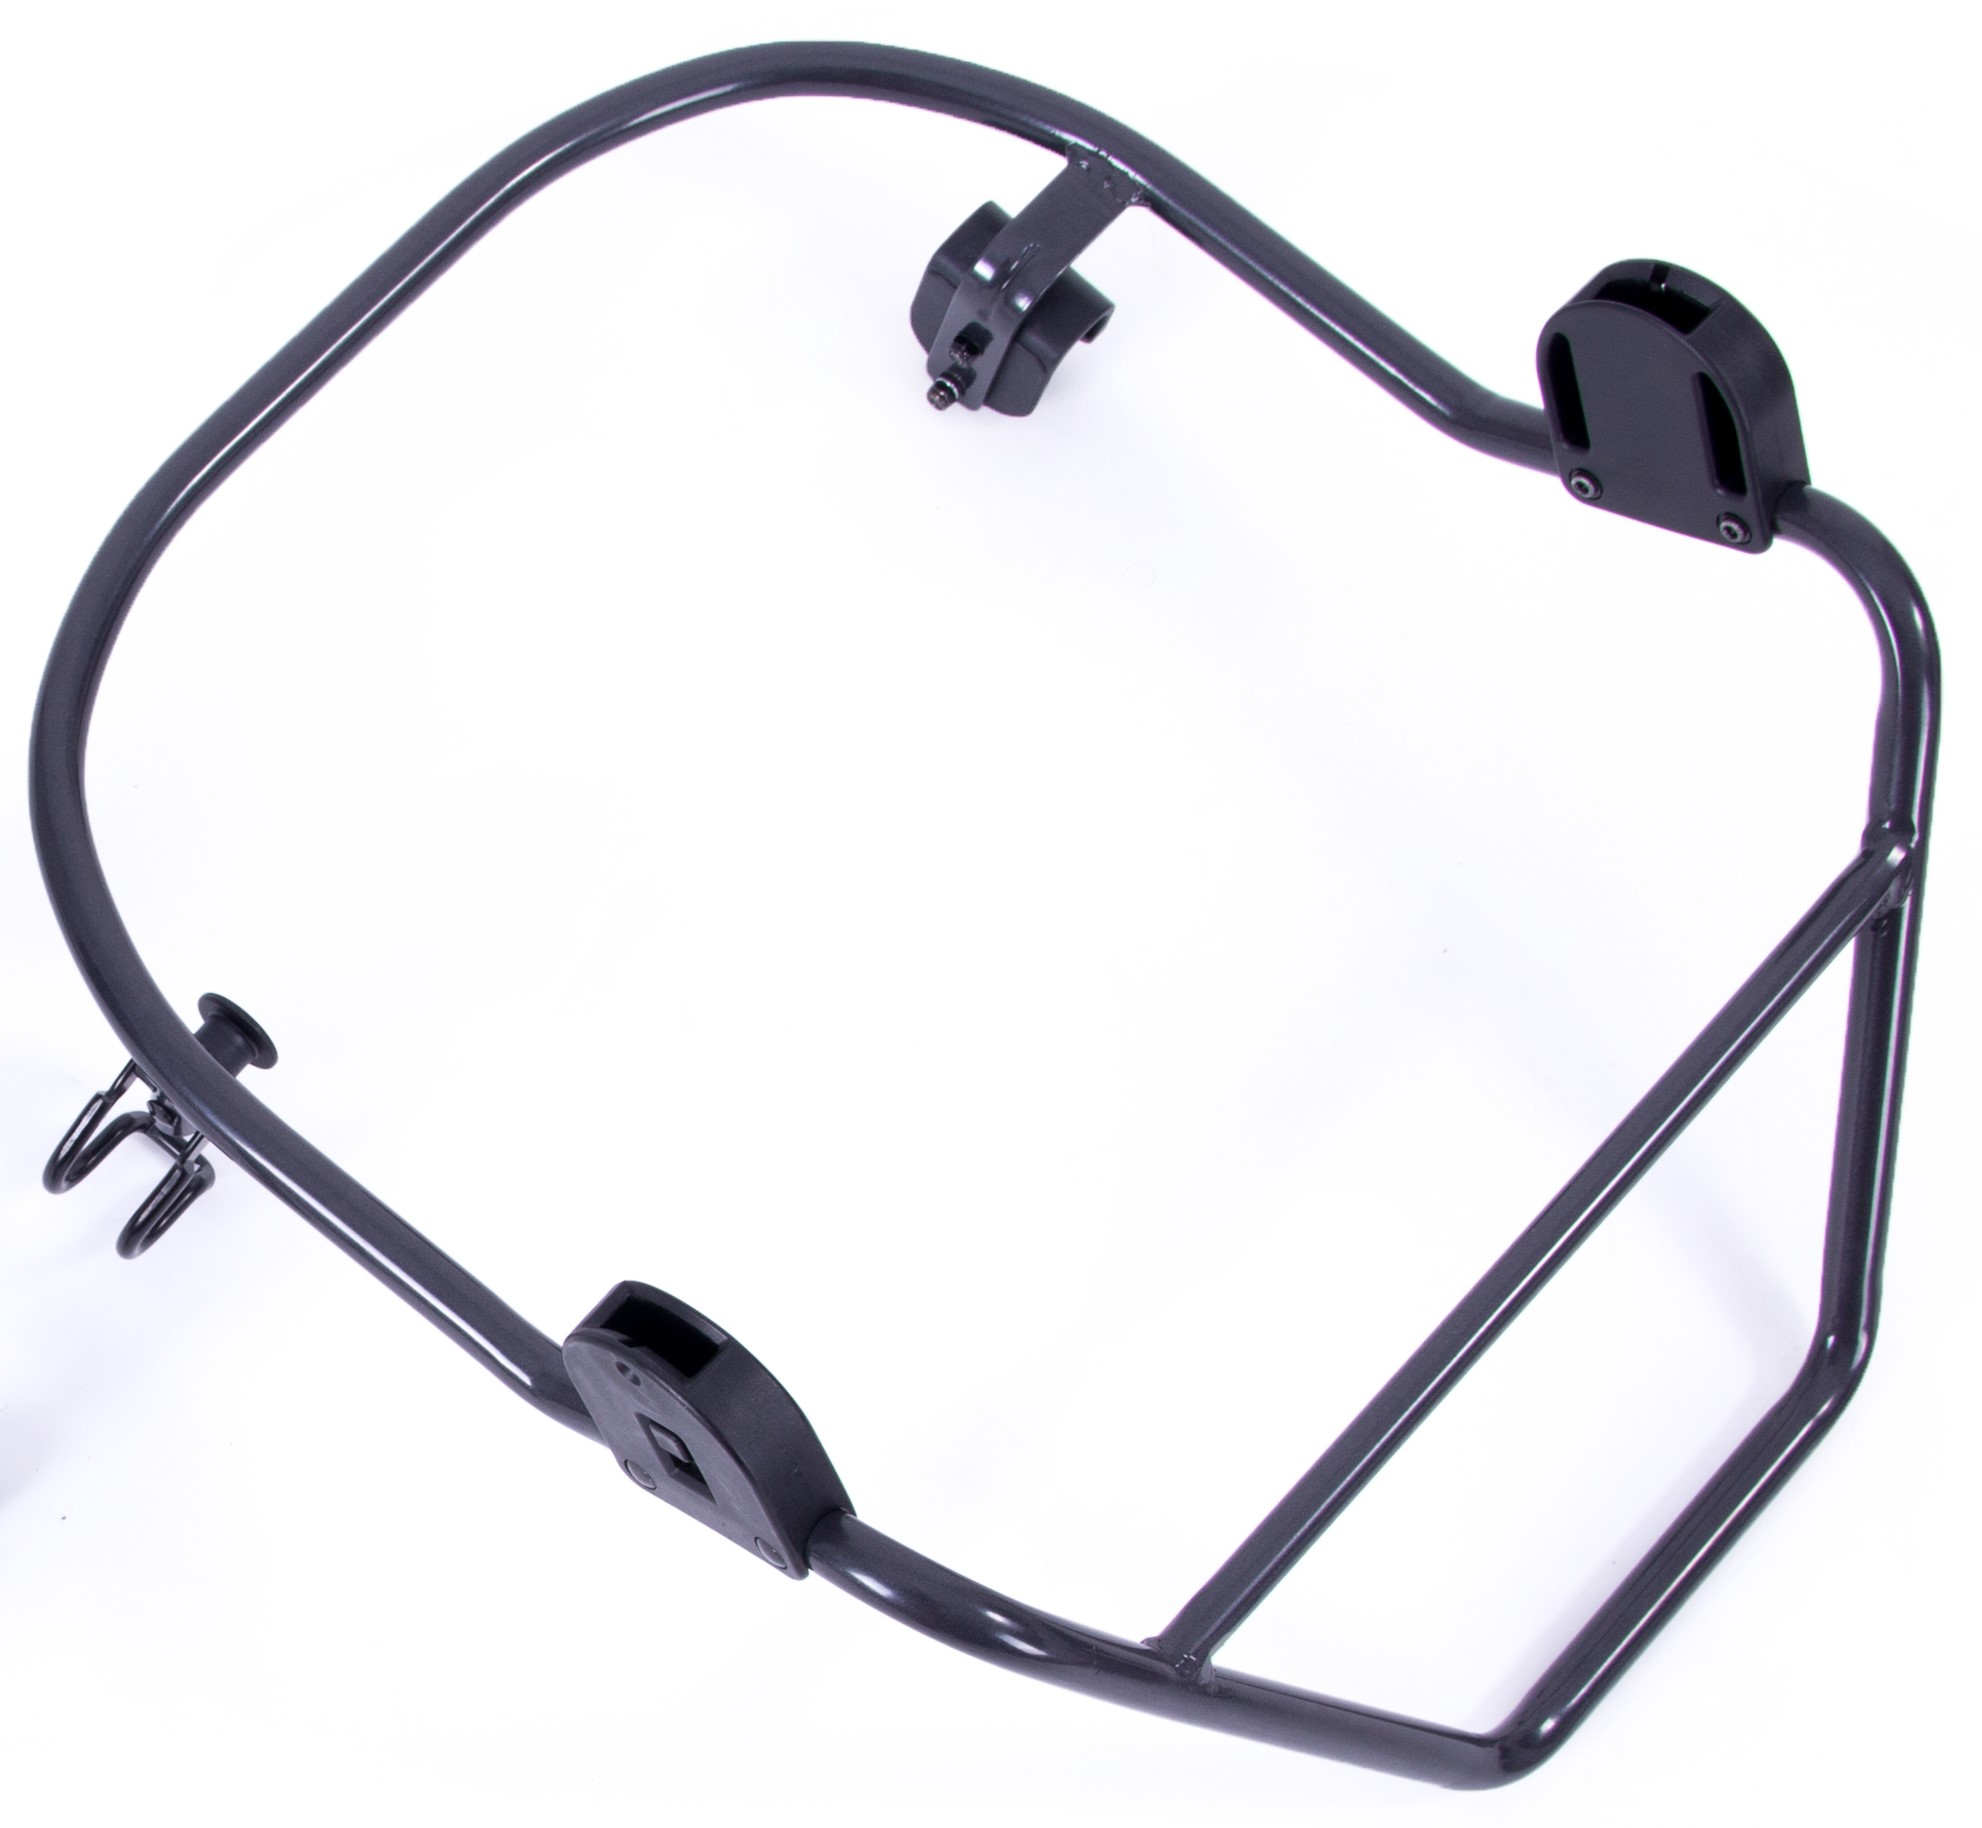 EASY TWIN adaptér spodní na autosedačku